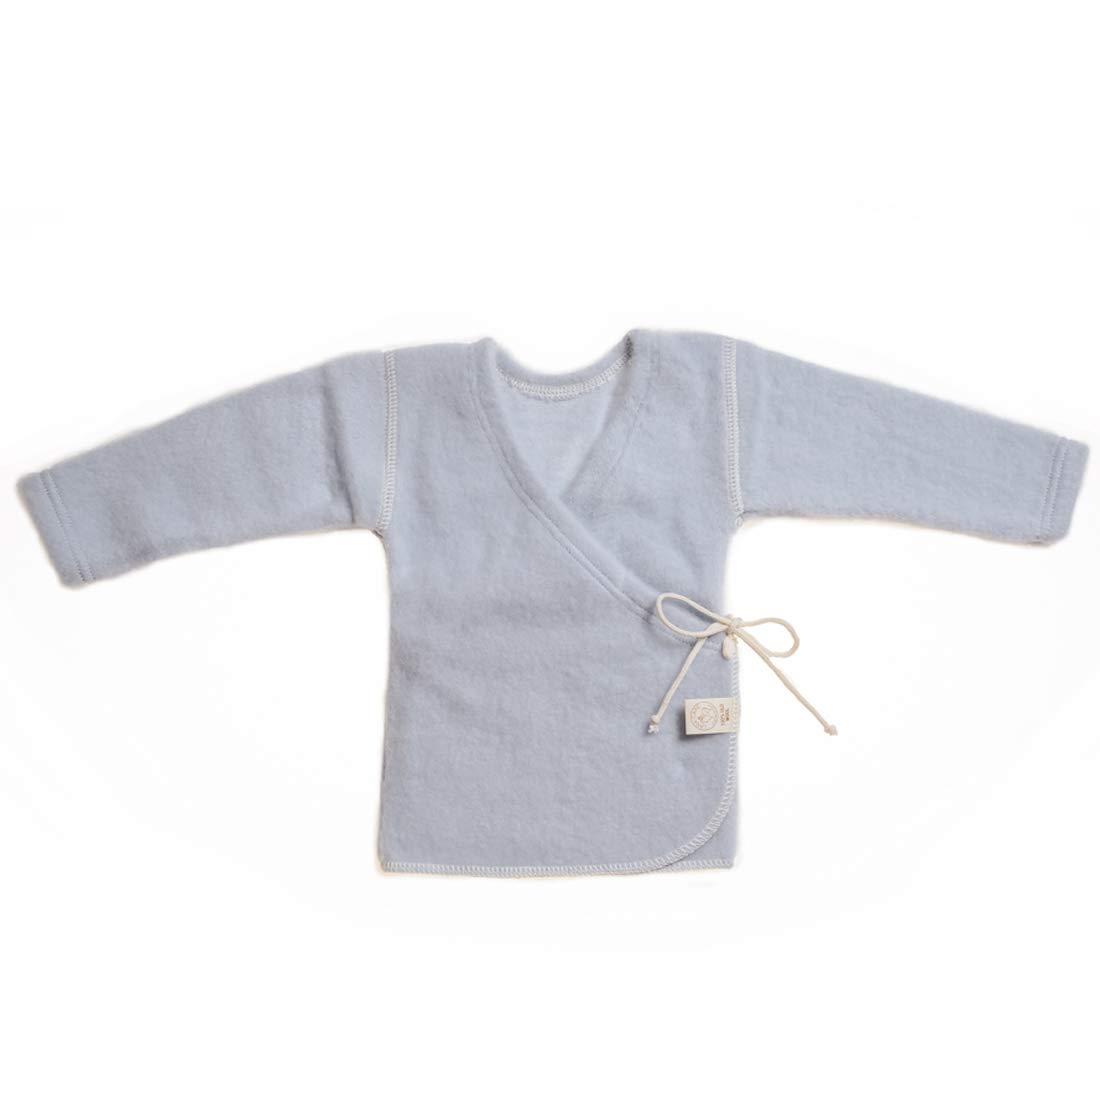 LANACARE Organic Wool Baby Sweater, Light Blue, Size 50 (0-3 mo) by LANACare